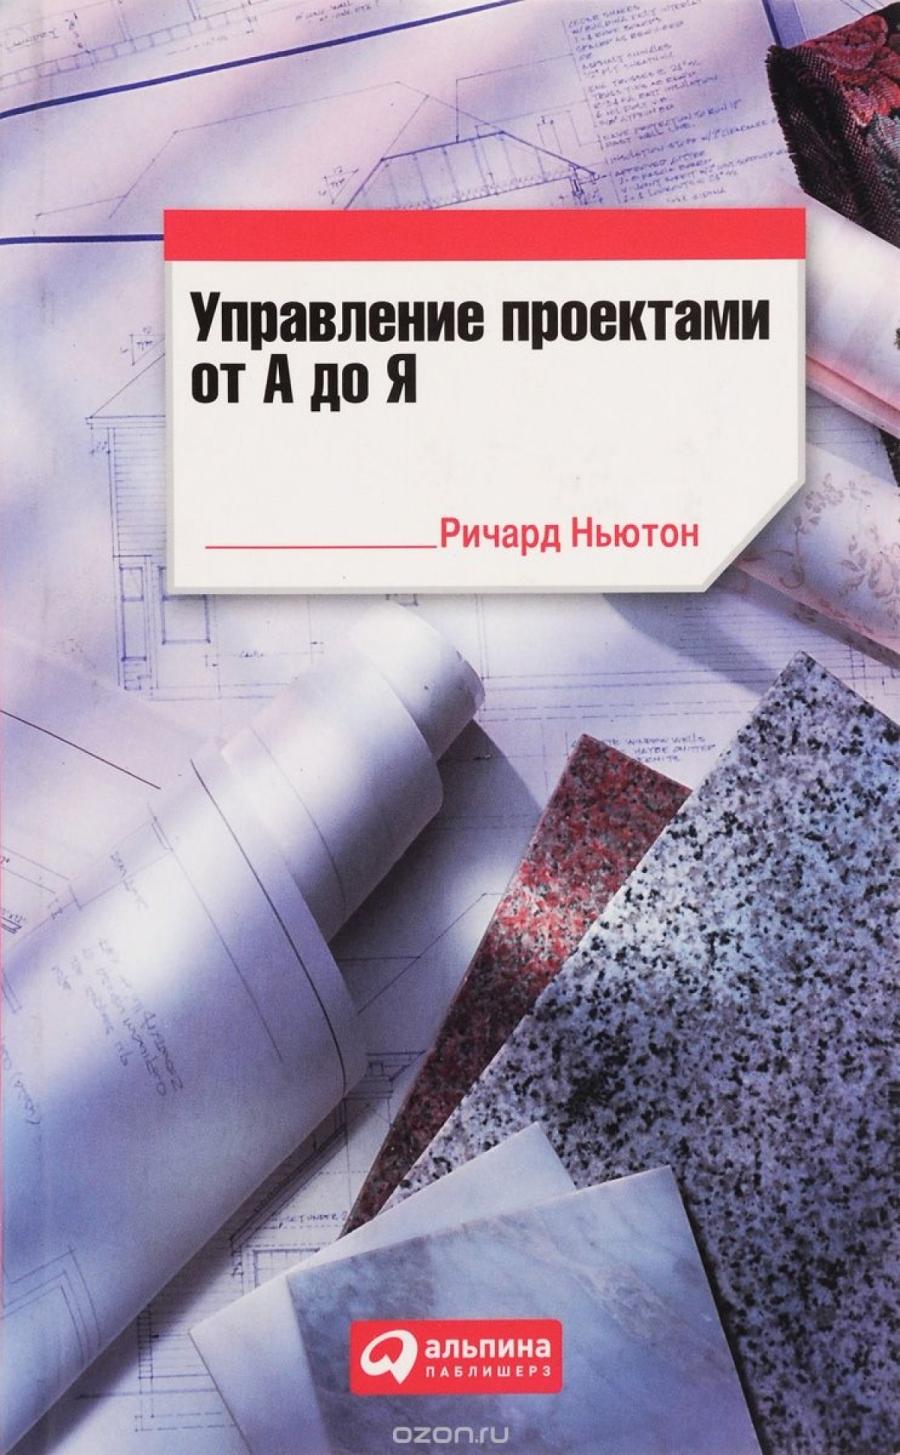 Обложка книги:  ричард ньютон - управление проектами от а до я.